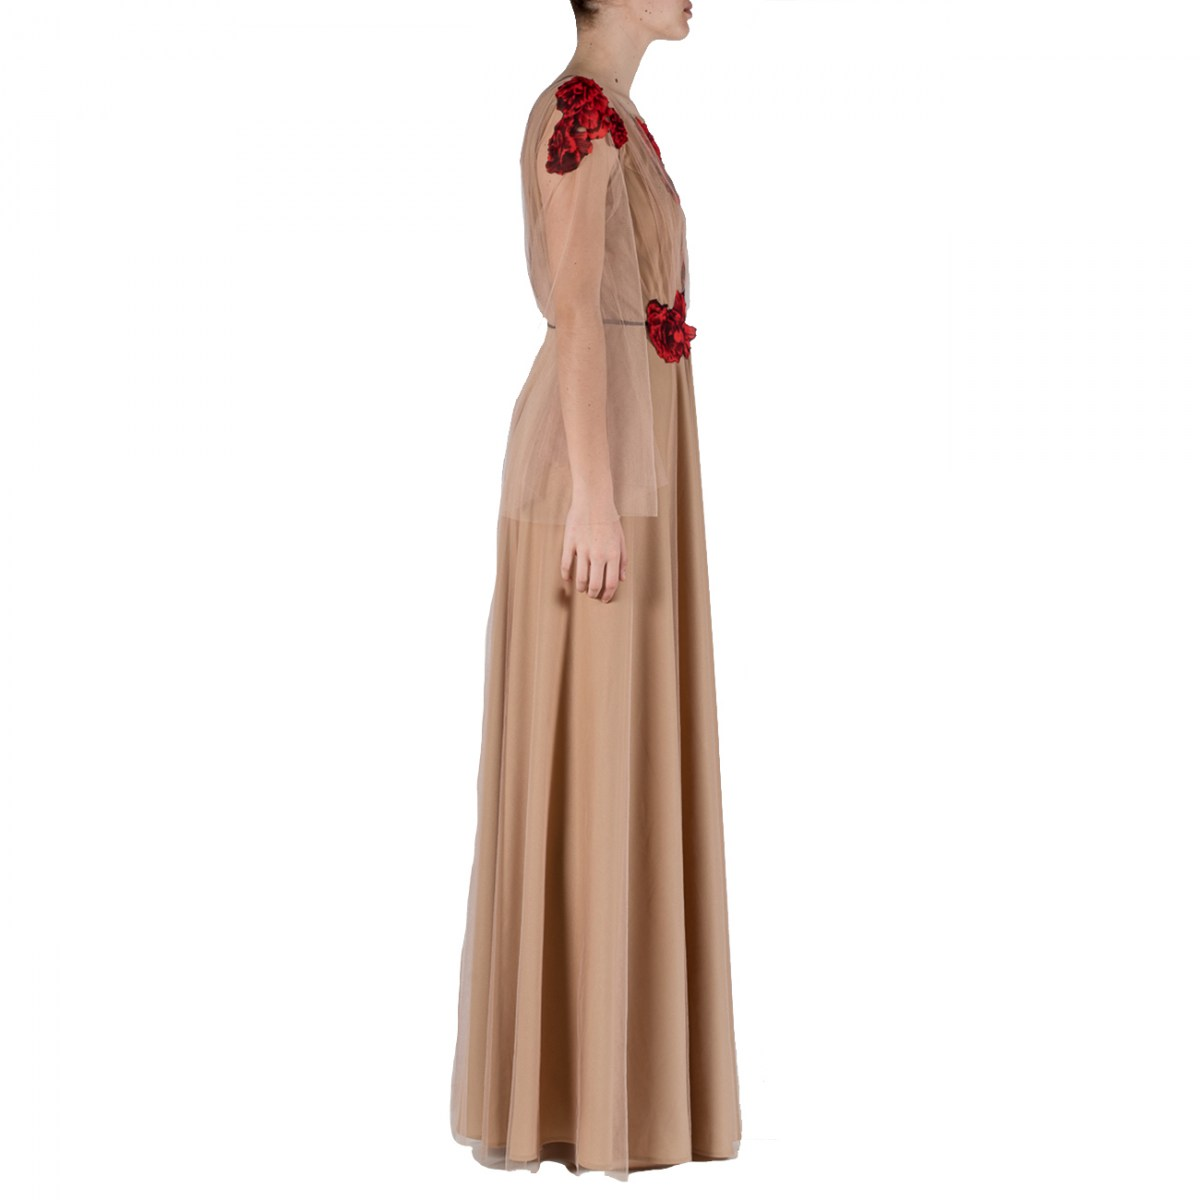 555c41e0699b ΠΡΟΙΟΝΤΑ    ΓΥΝΑΙΚΑ    ΡΟΥΧΑ    ΦΟΡΕΜΑΤΑ    JULYTWO LADIES AIANES MAXI  DRESS RED FLOWERS 18101